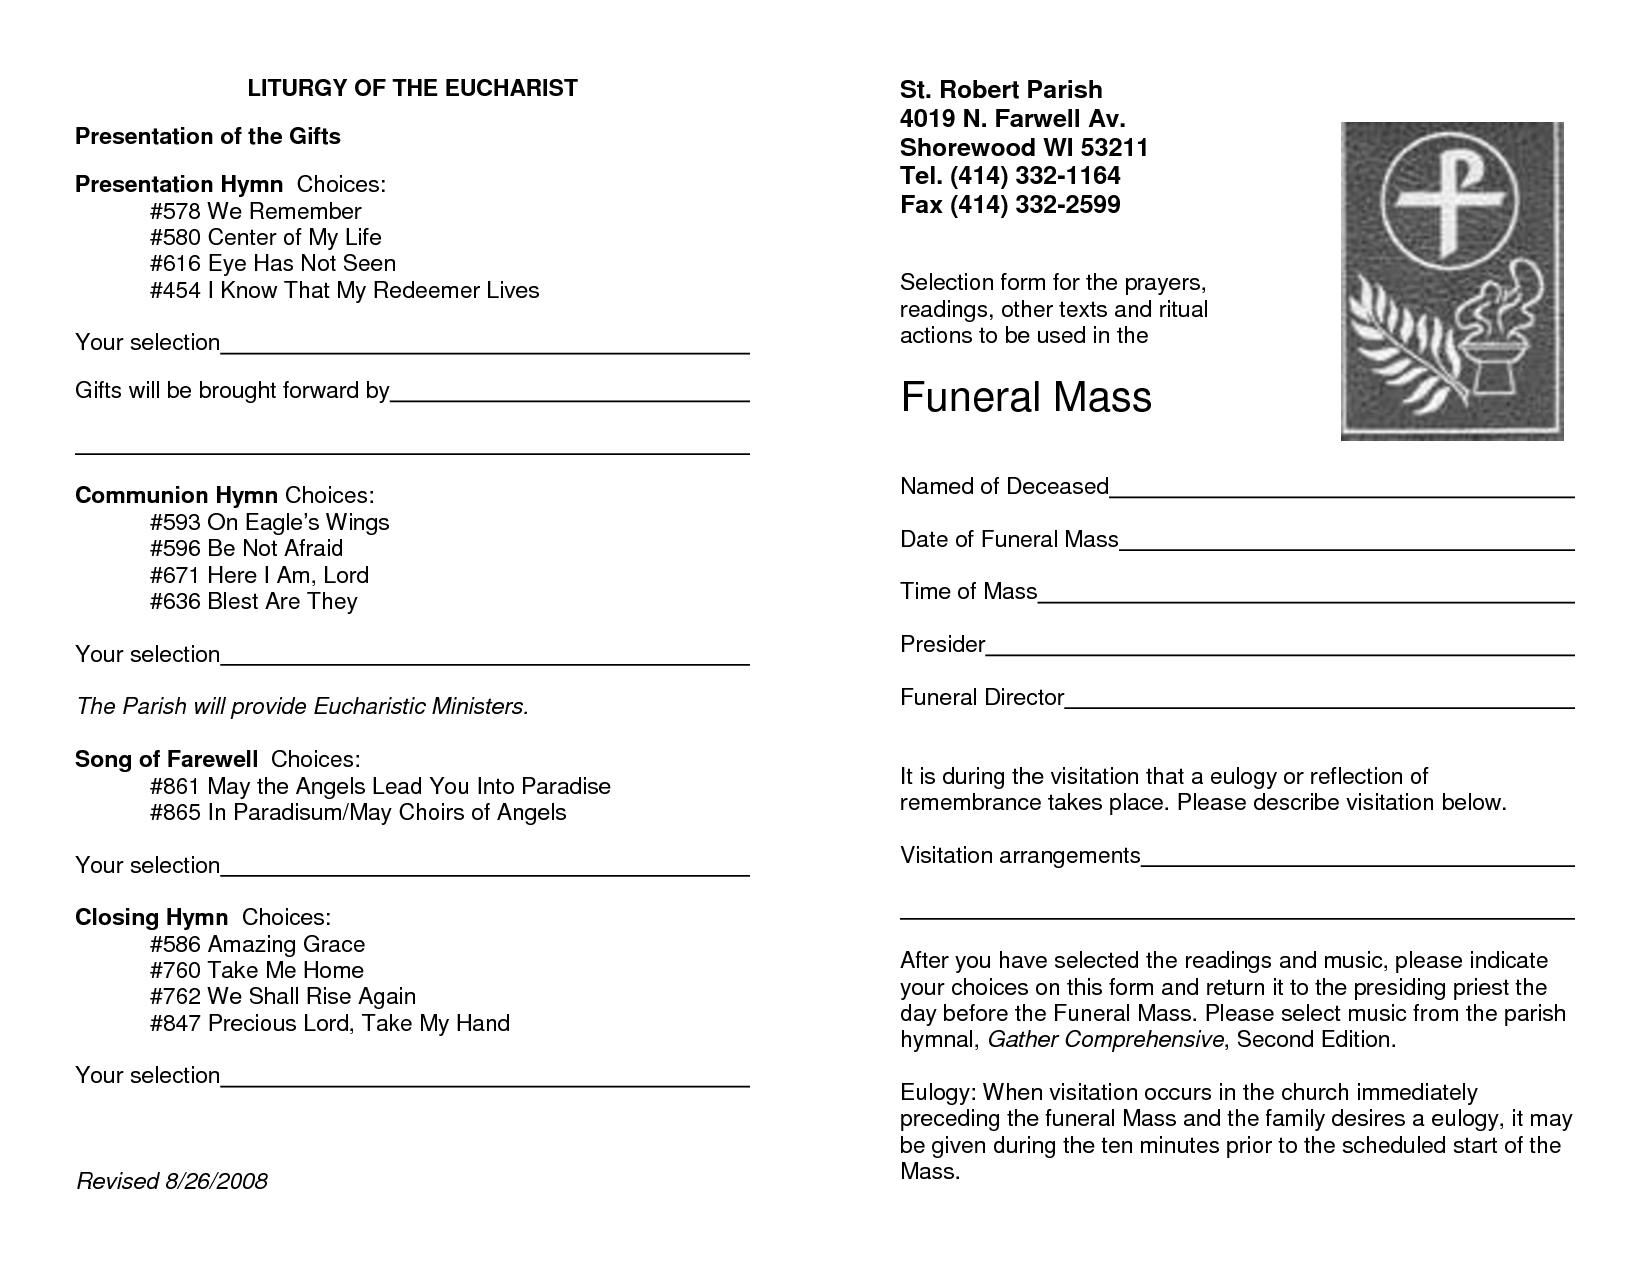 LiturgyTools.net: Template booklet for a Catholic funeral Mass